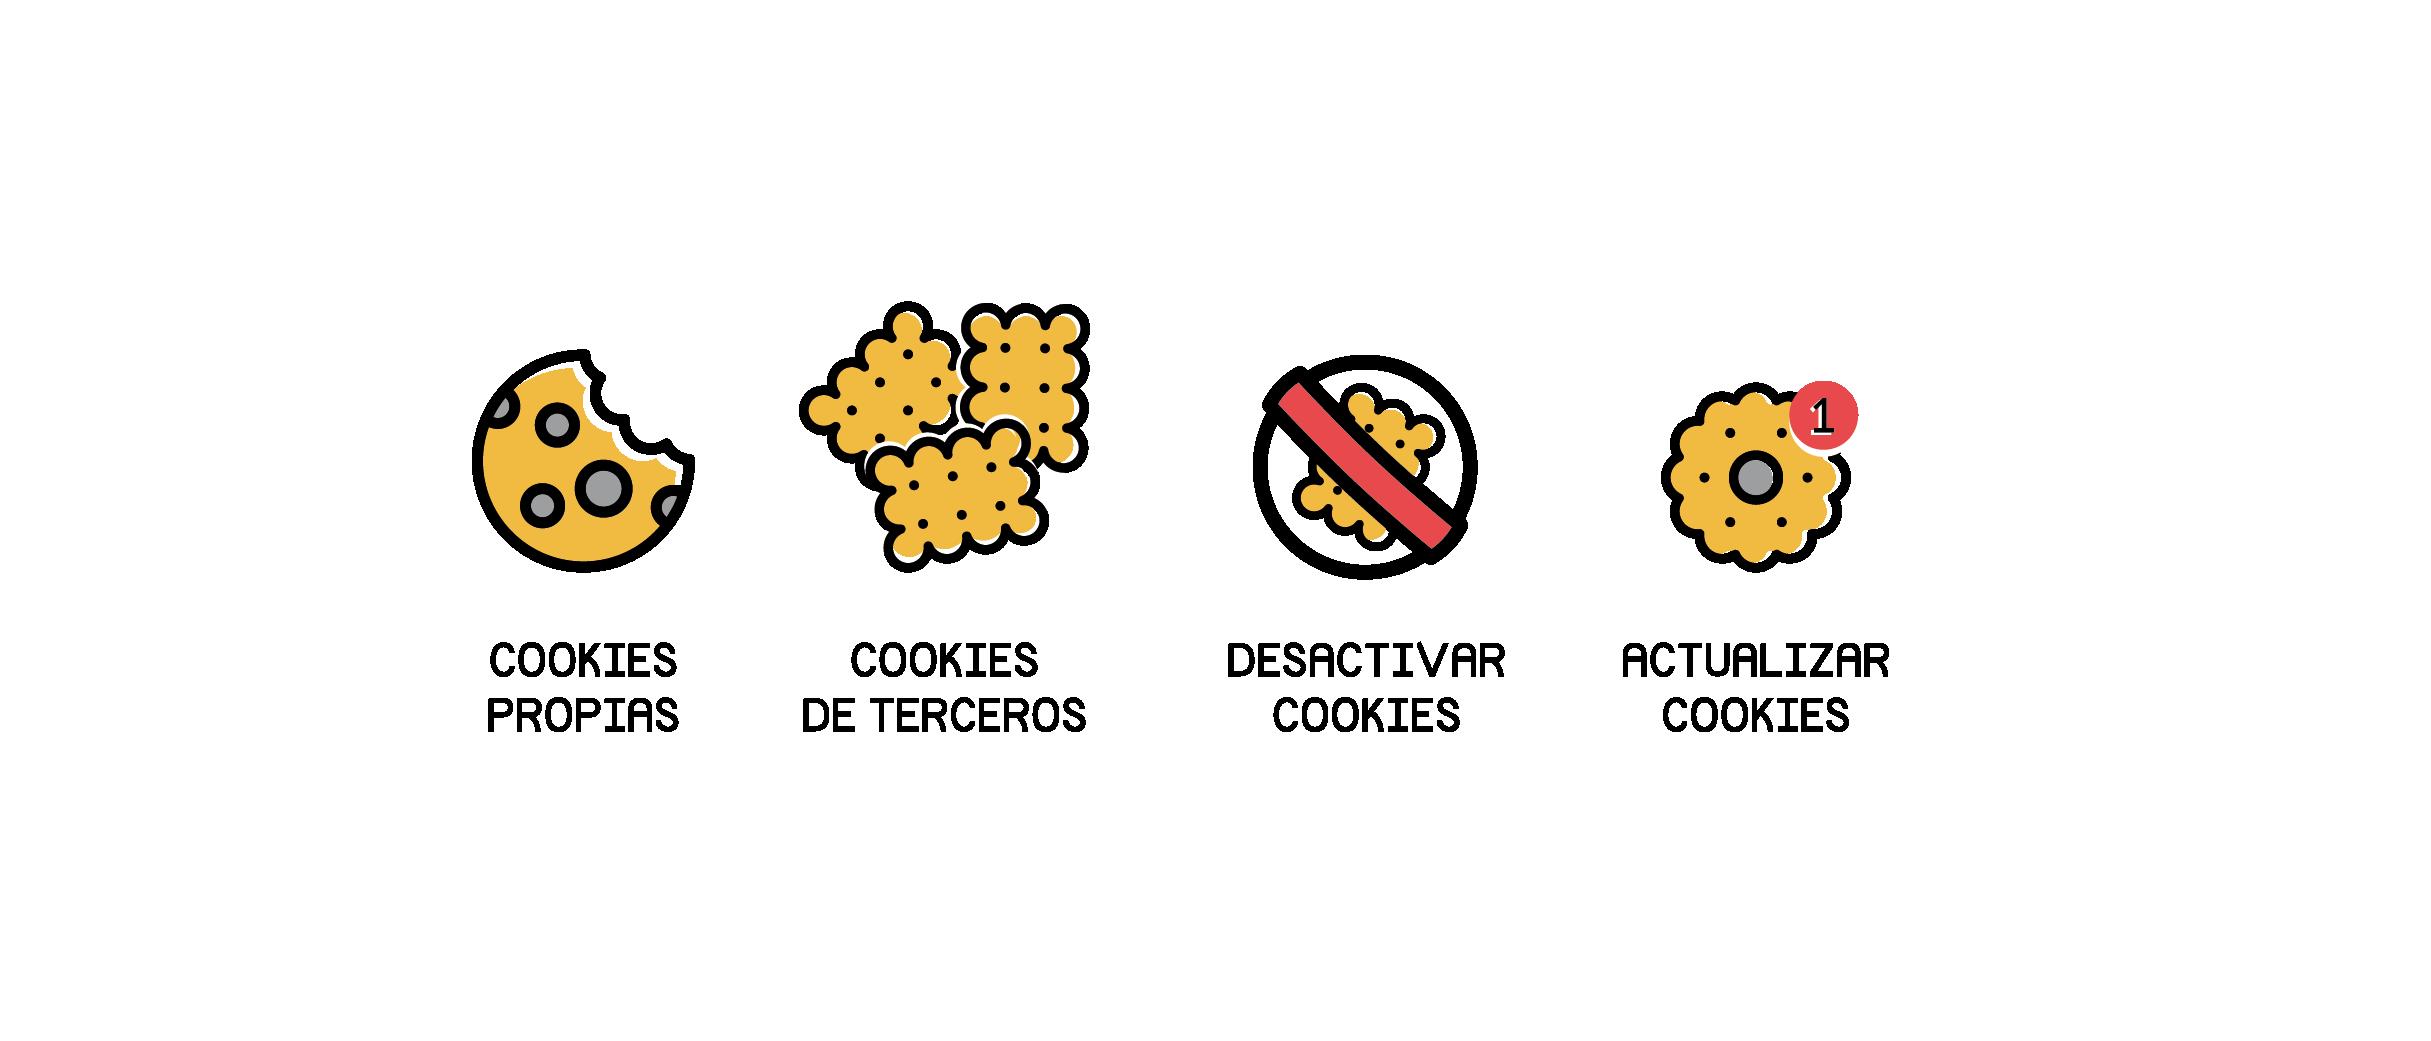 Icono Uso de Cookies